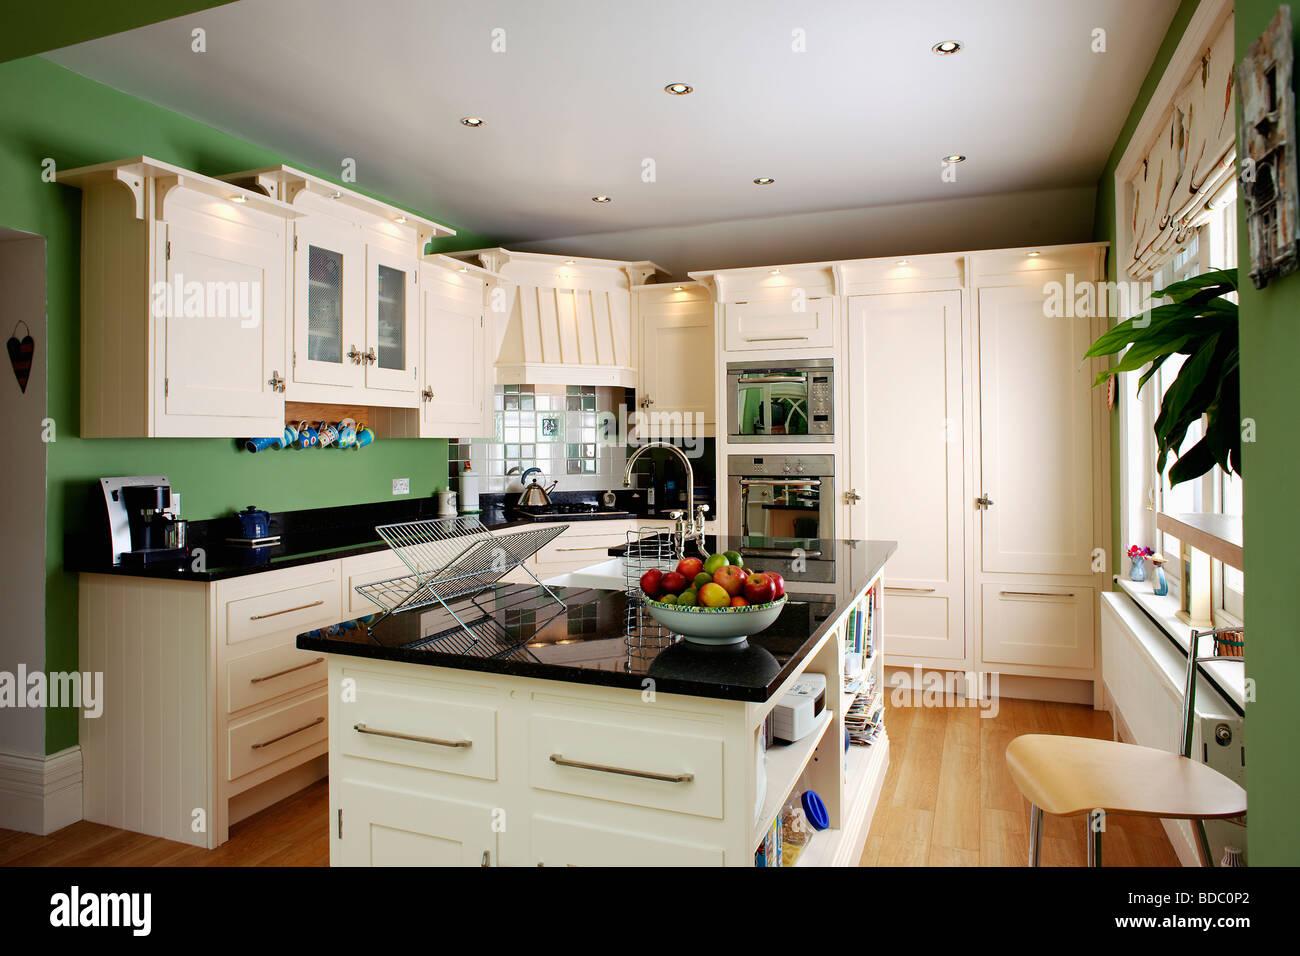 Interiors Traditional Green Kitchens Stockfotos & Interiors ...